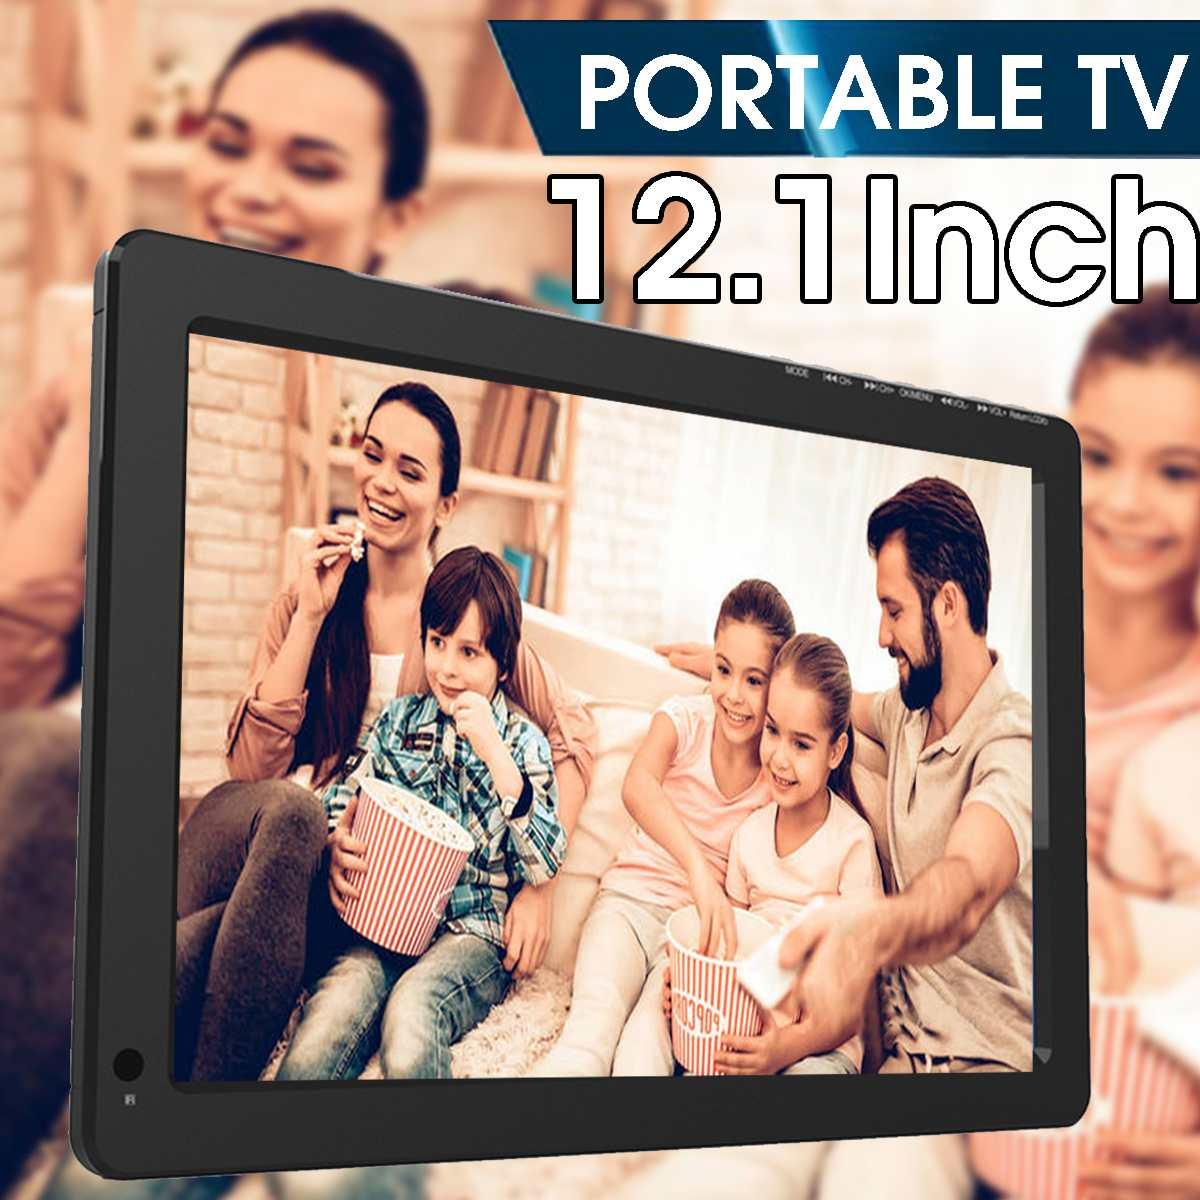 12V 18W 12.1 Inch Portable Digital Analog Mini TV DVB-T / DVB-T2 TFT LED 1080P HD Car TV Support TF Card USB Audio Eu Plug